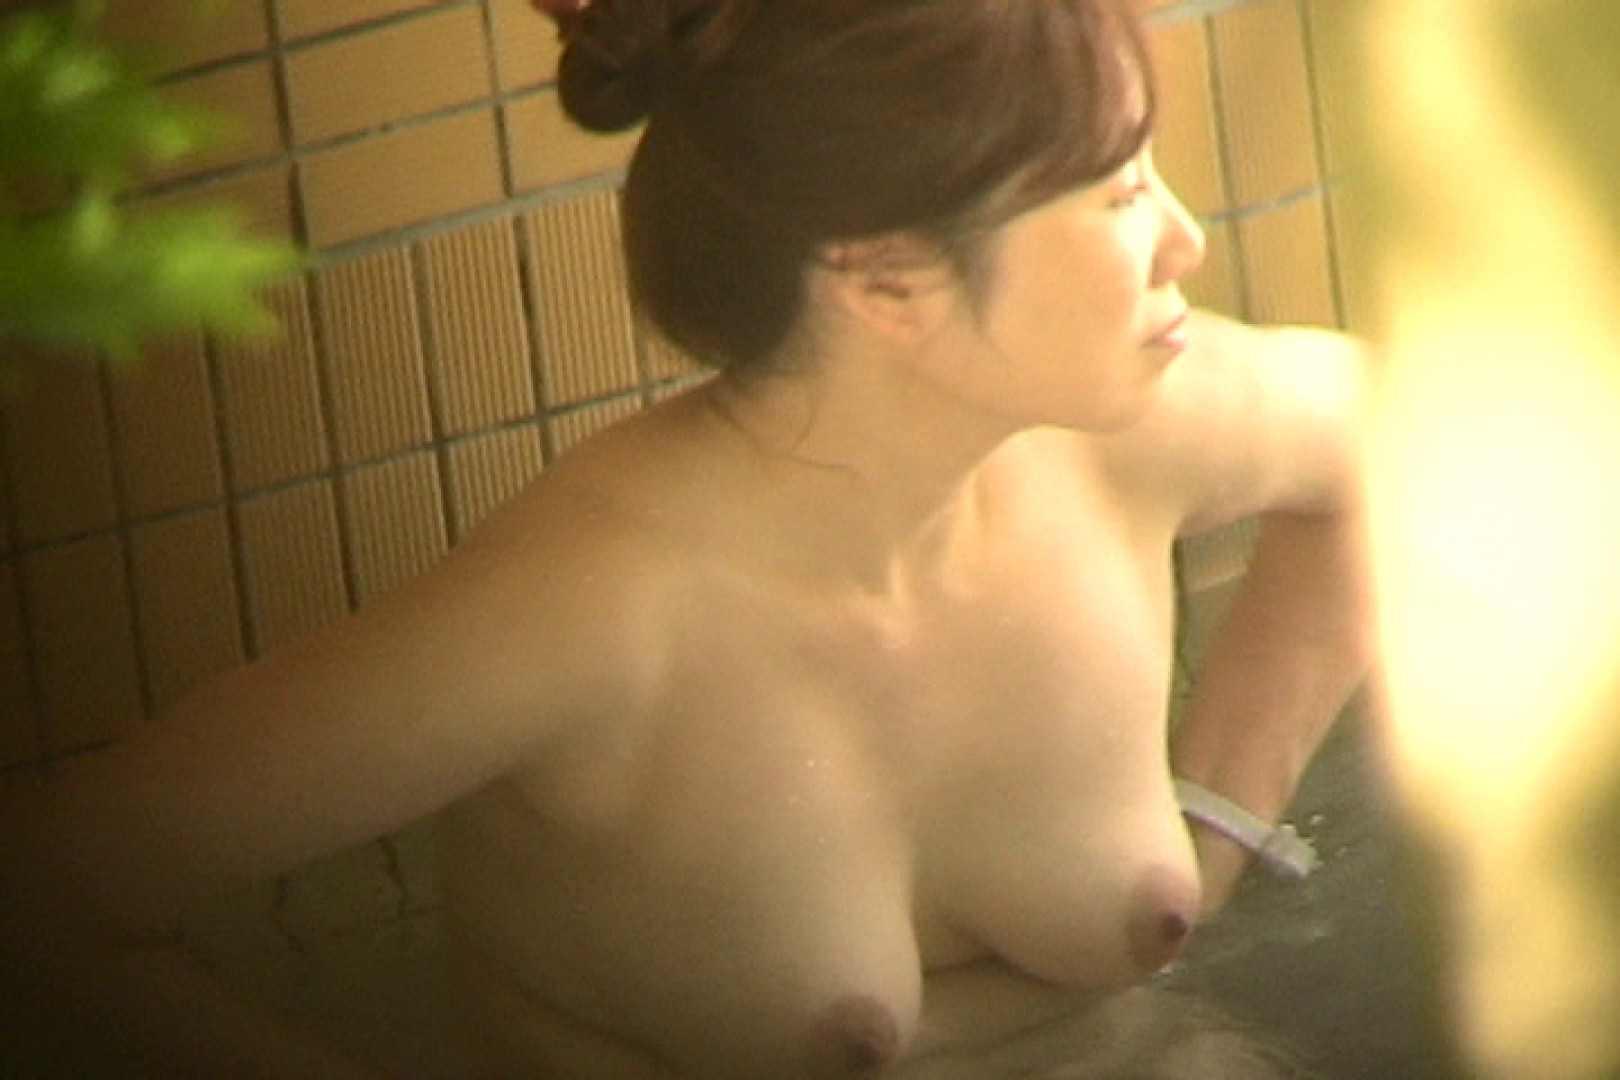 Aquaな露天風呂Vol.452 露天風呂編  112PIX 86